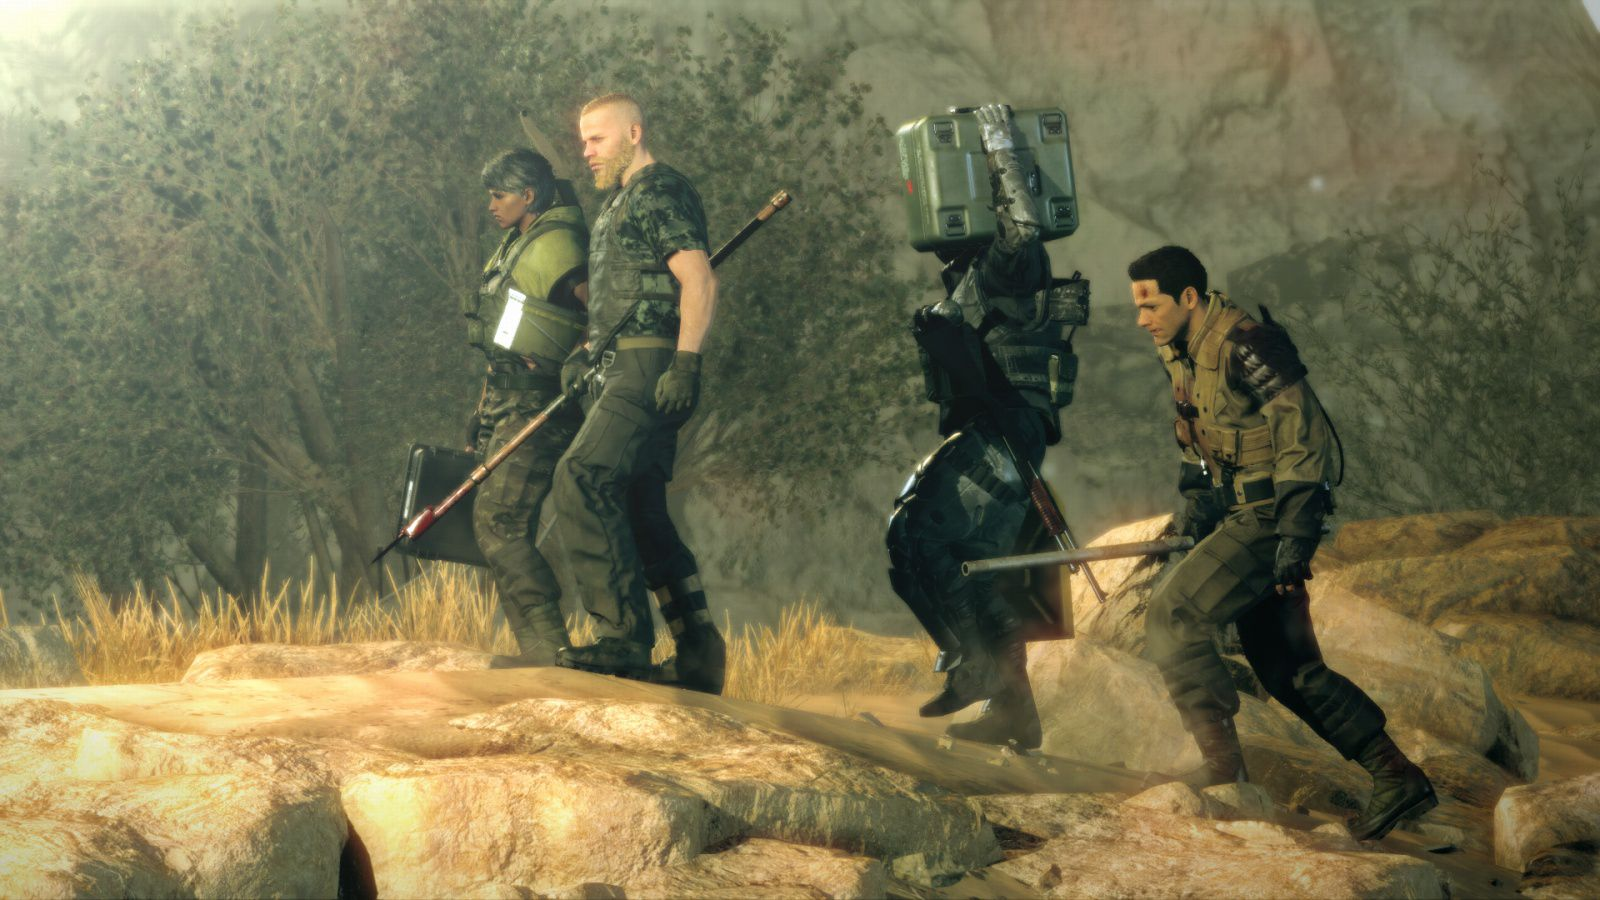 Essential Metal Gear games to play before Metal Gear Solid